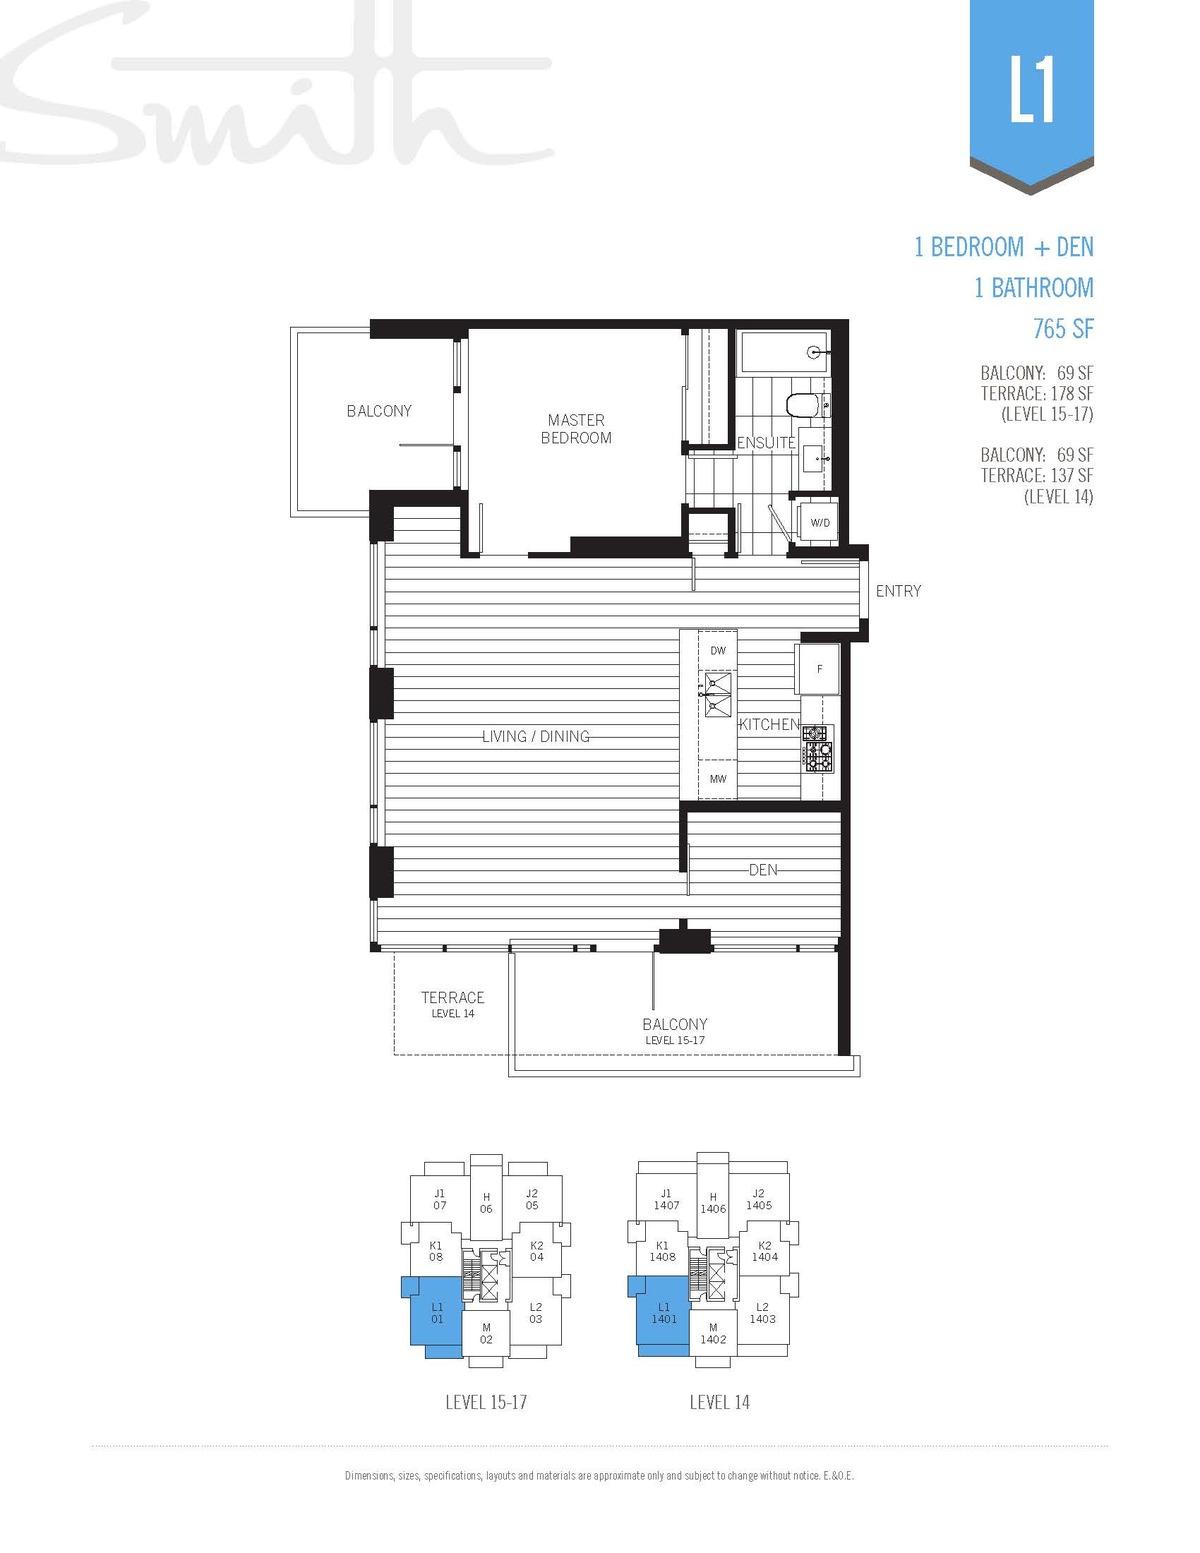 Smith Floorplan L1